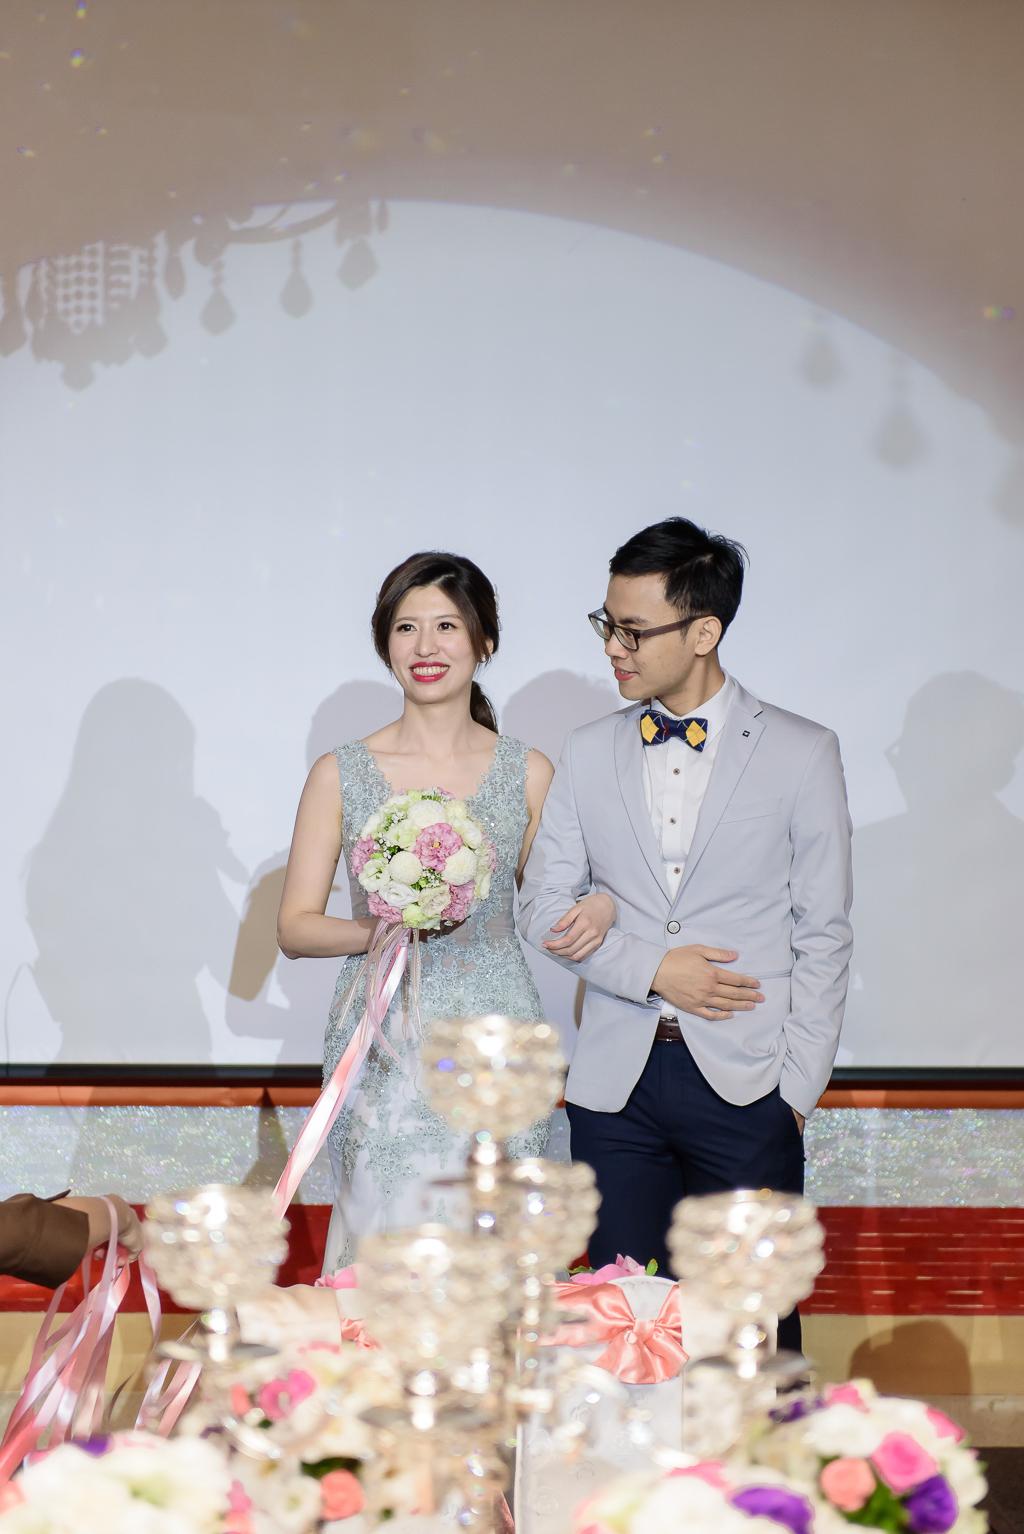 Wedding day-0083 ,僑園婚攝,台中僑園,僑園婚宴,新秘Alice ,婚攝小勇,台北婚攝, 小淑造型團隊